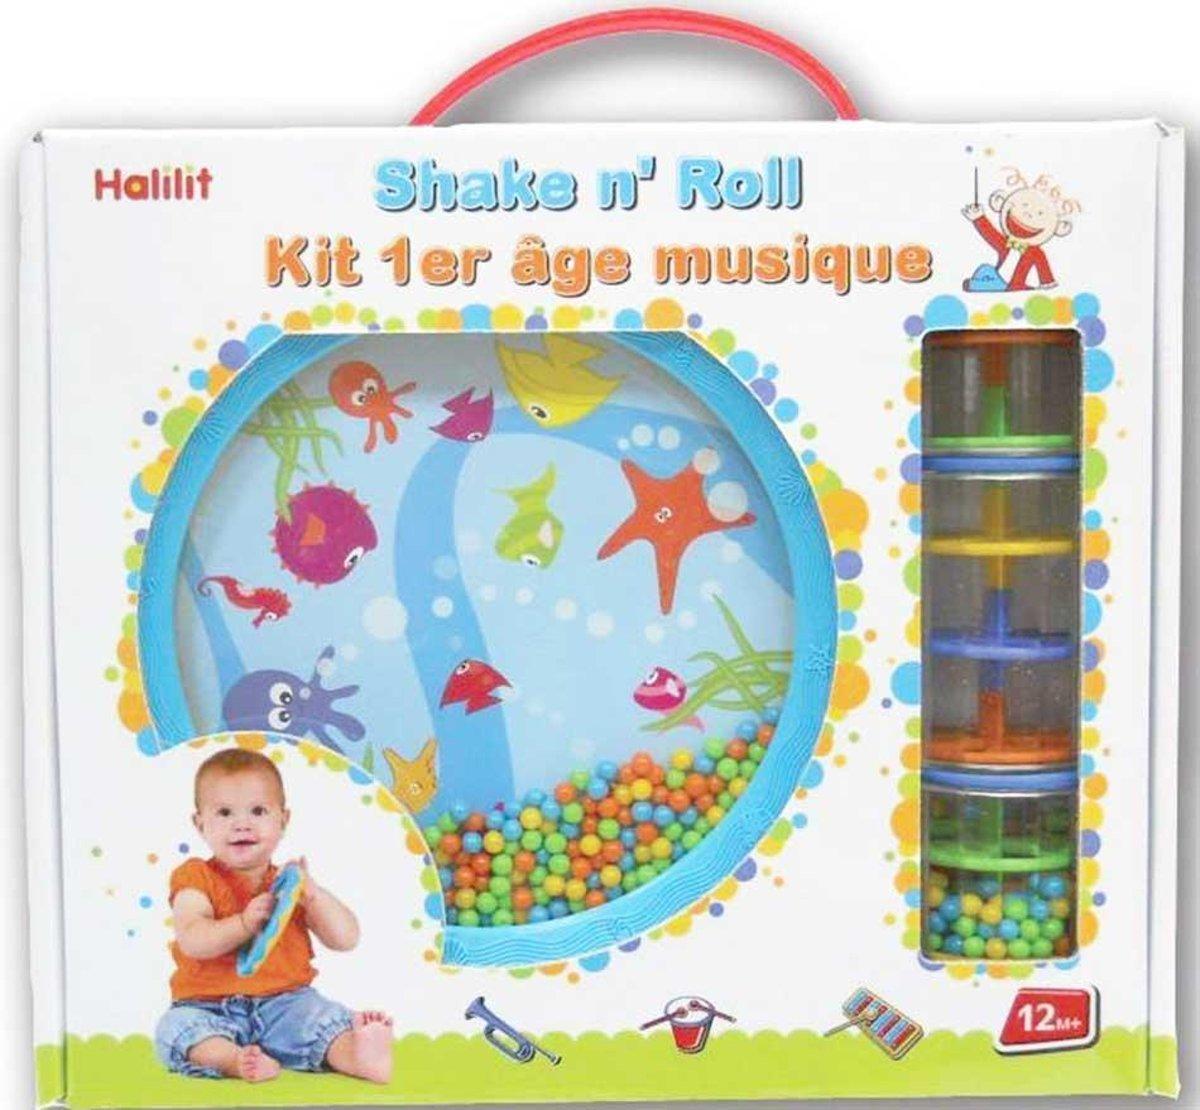 Halilit Shake 'N' Roll